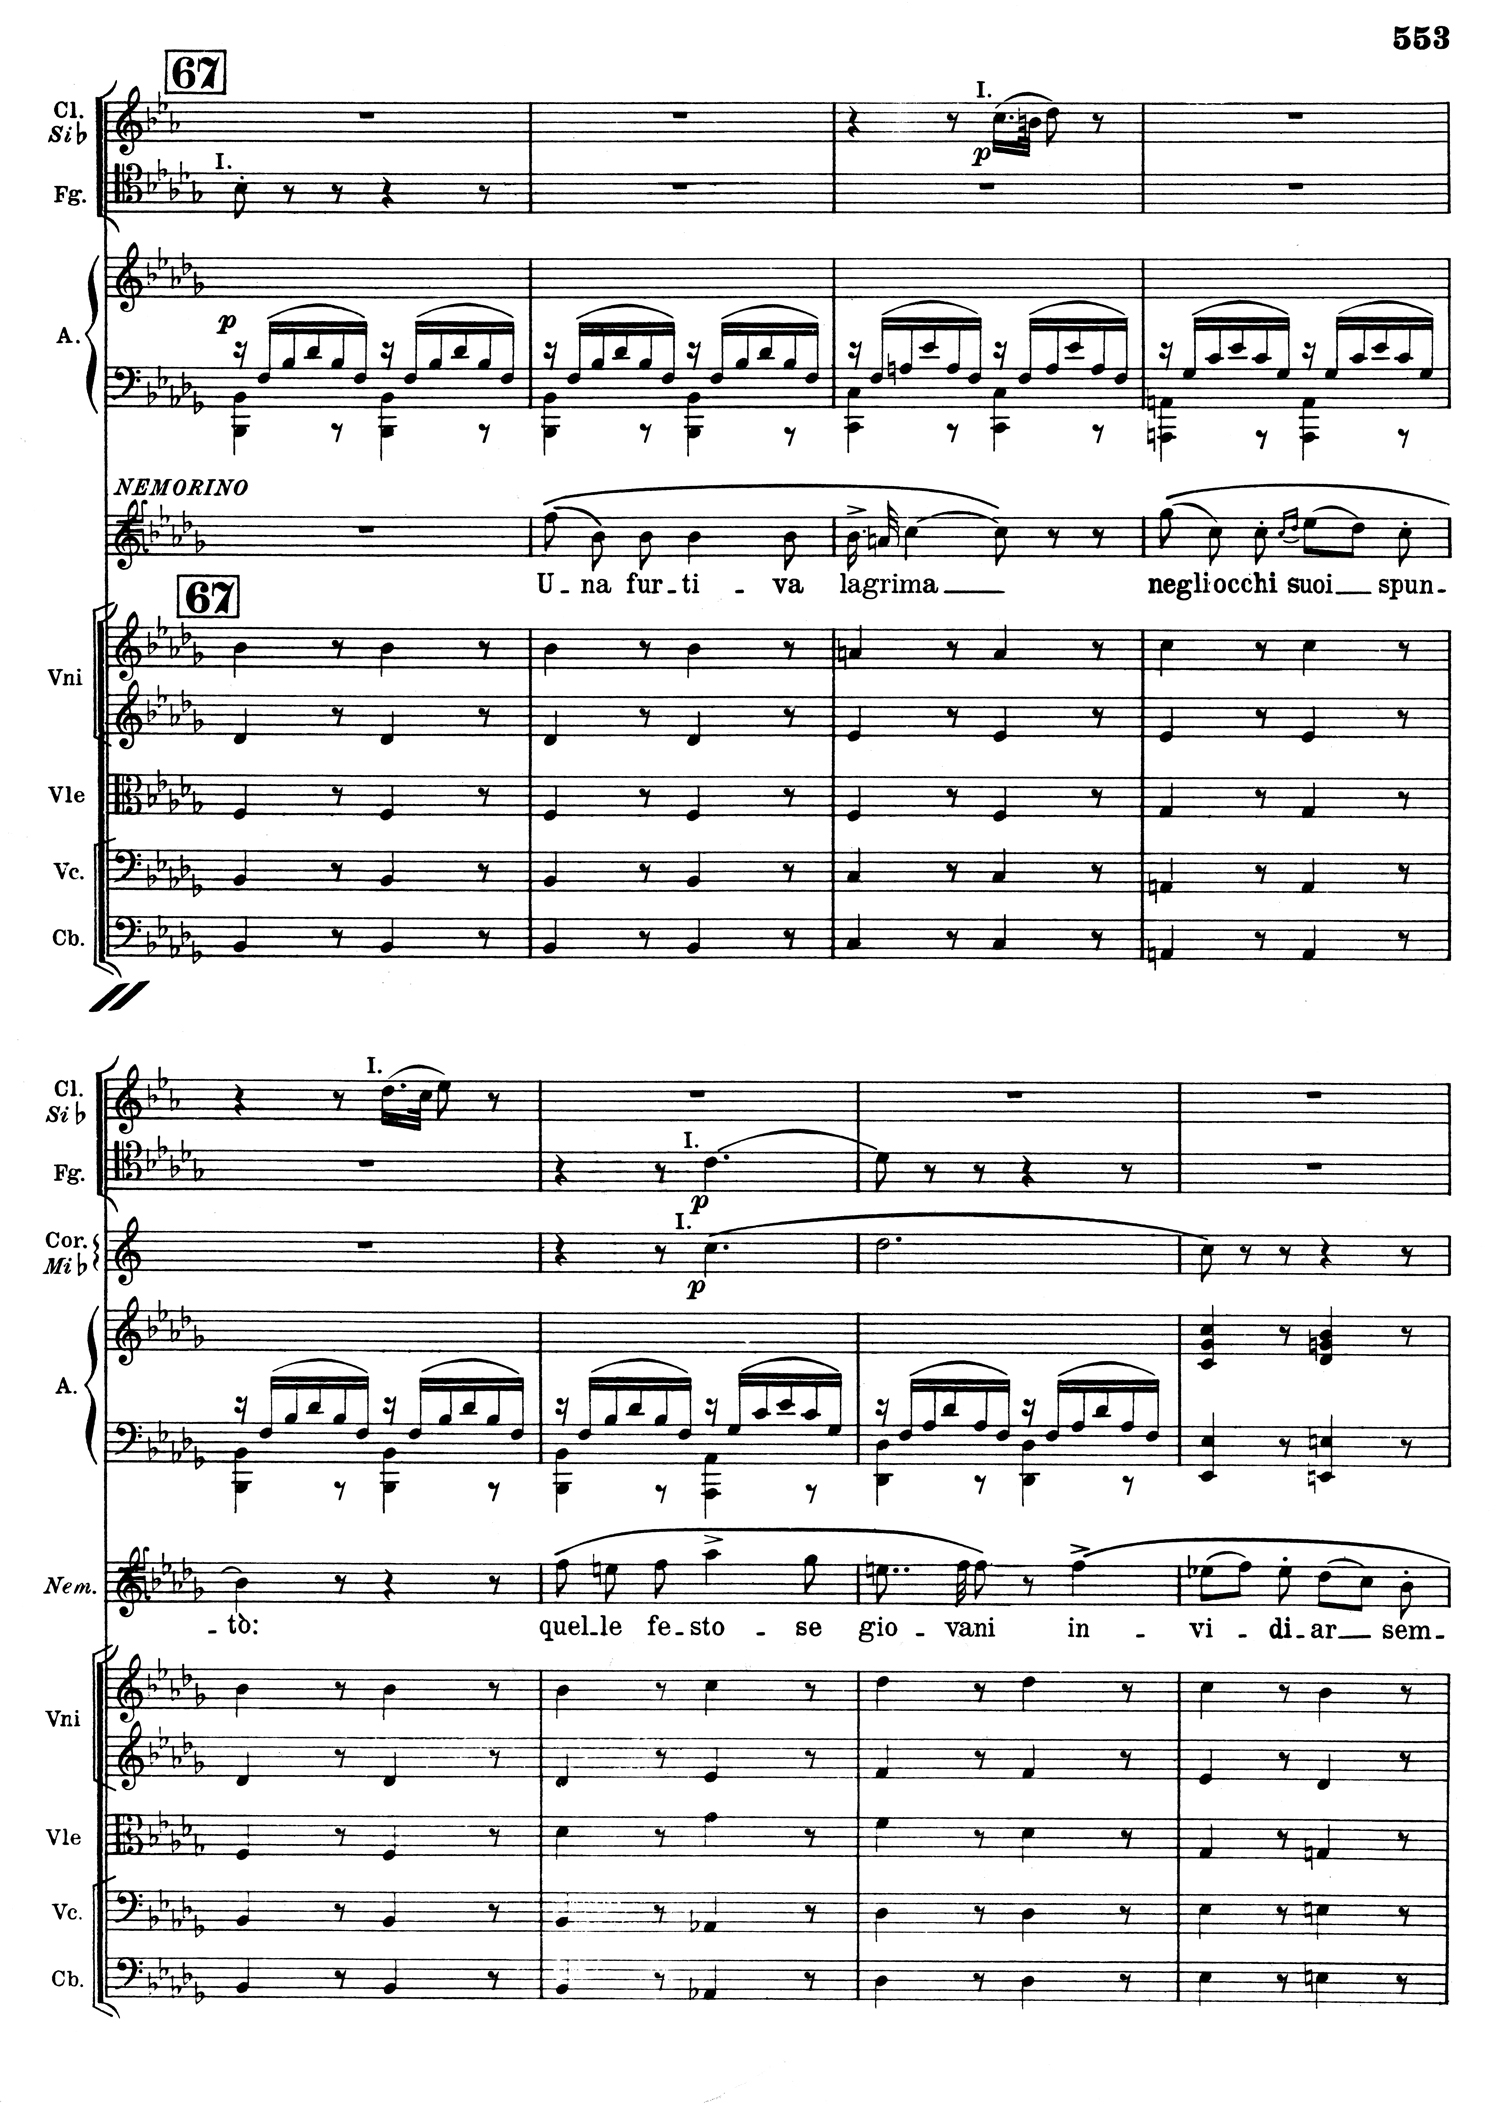 Donizetti Score 2.jpg